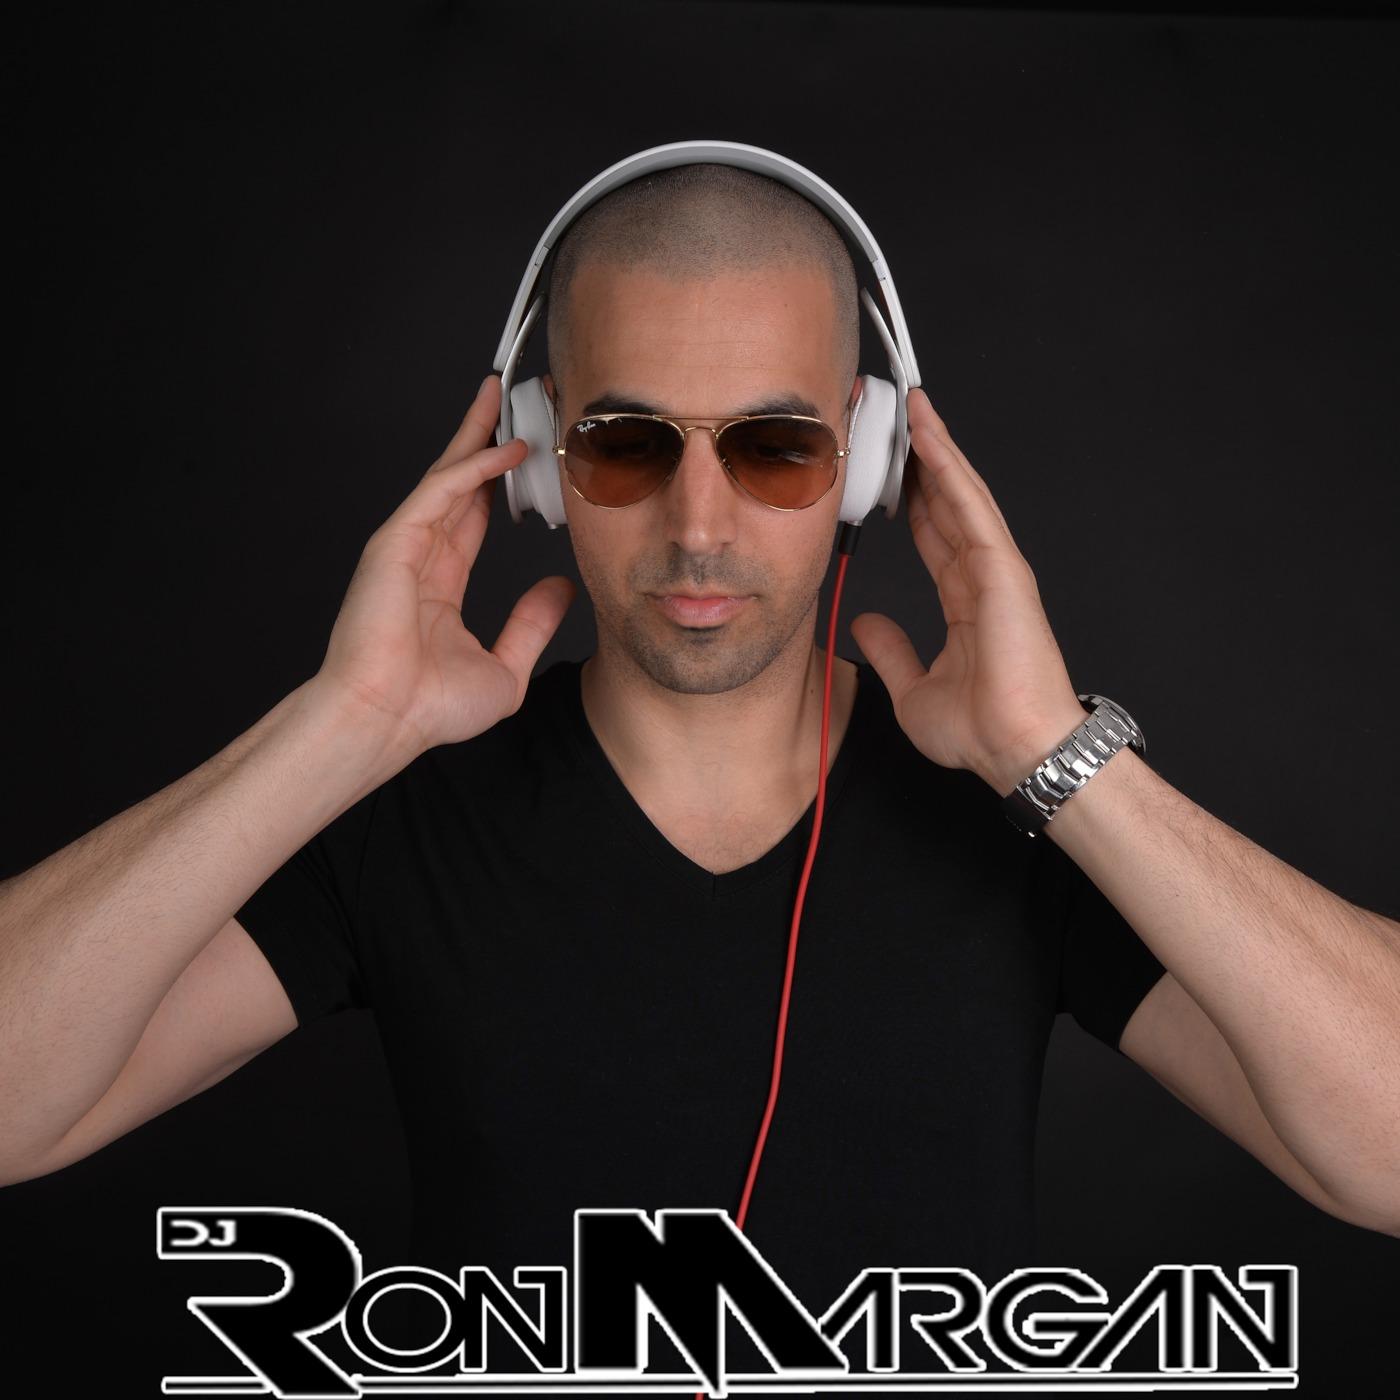 DJ Ron Margan EDM Podcast